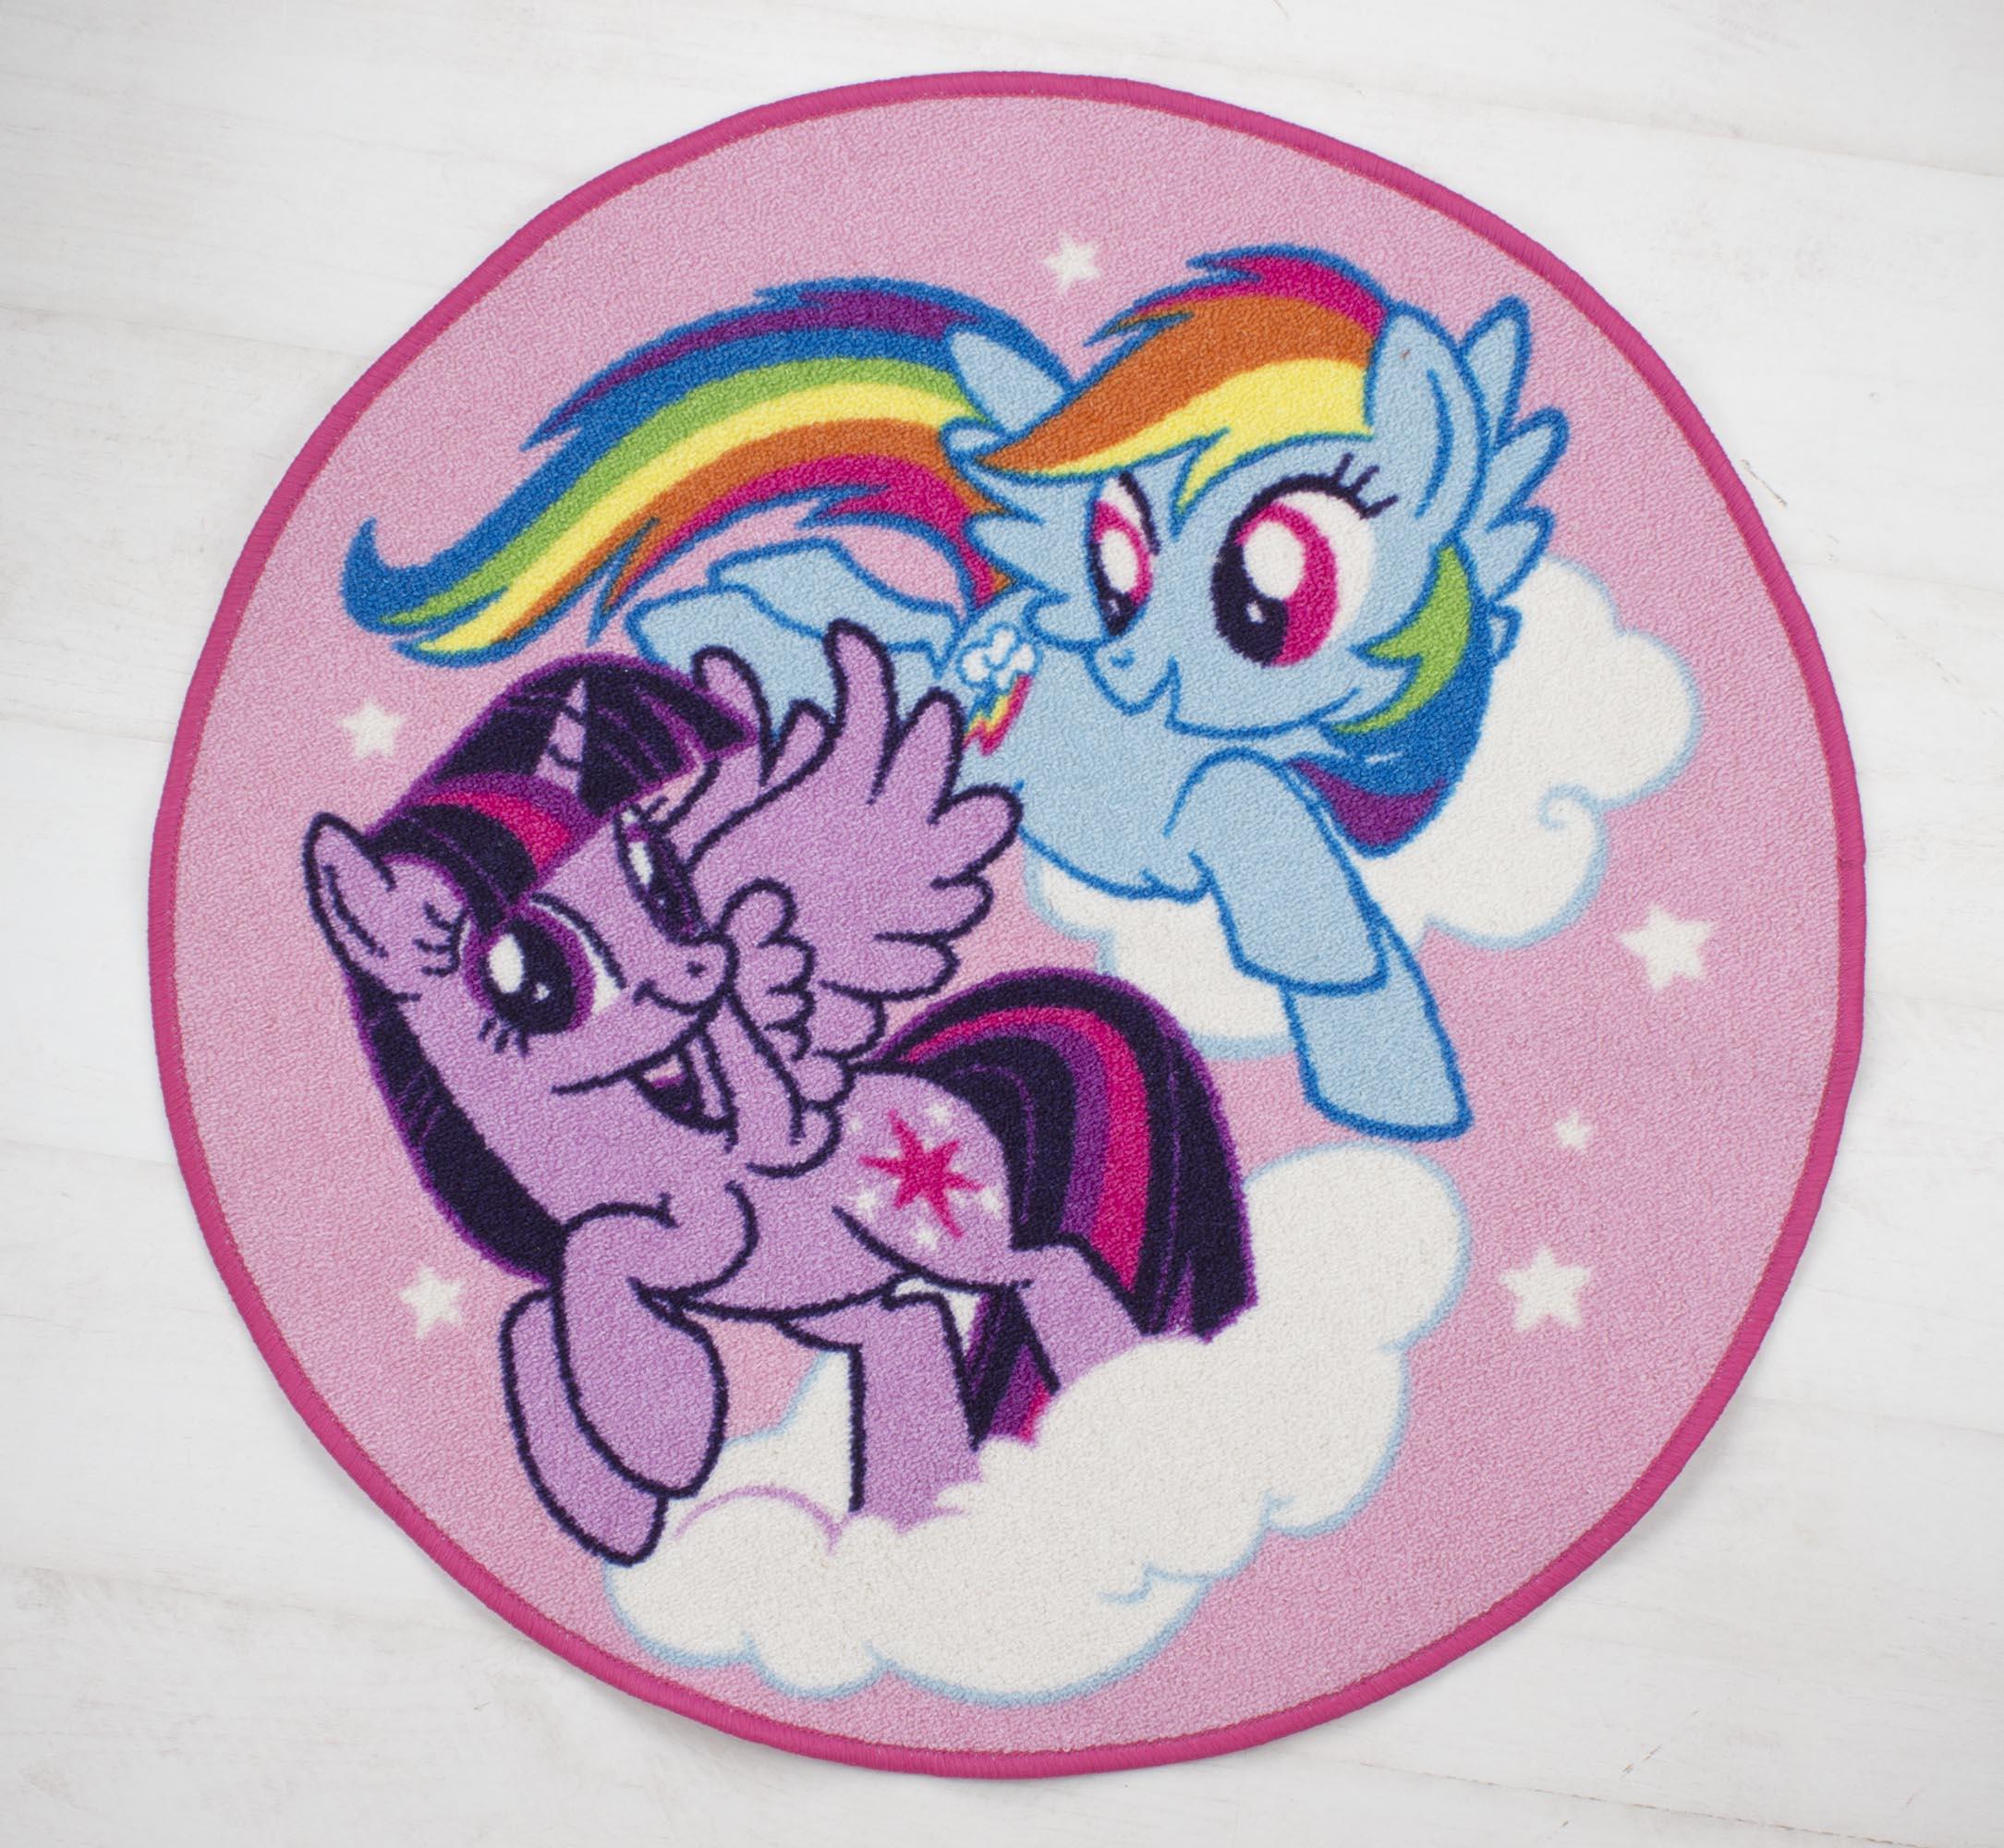 New My Little Pony Equeatrian Rug Girls Kids Pink Bedroom